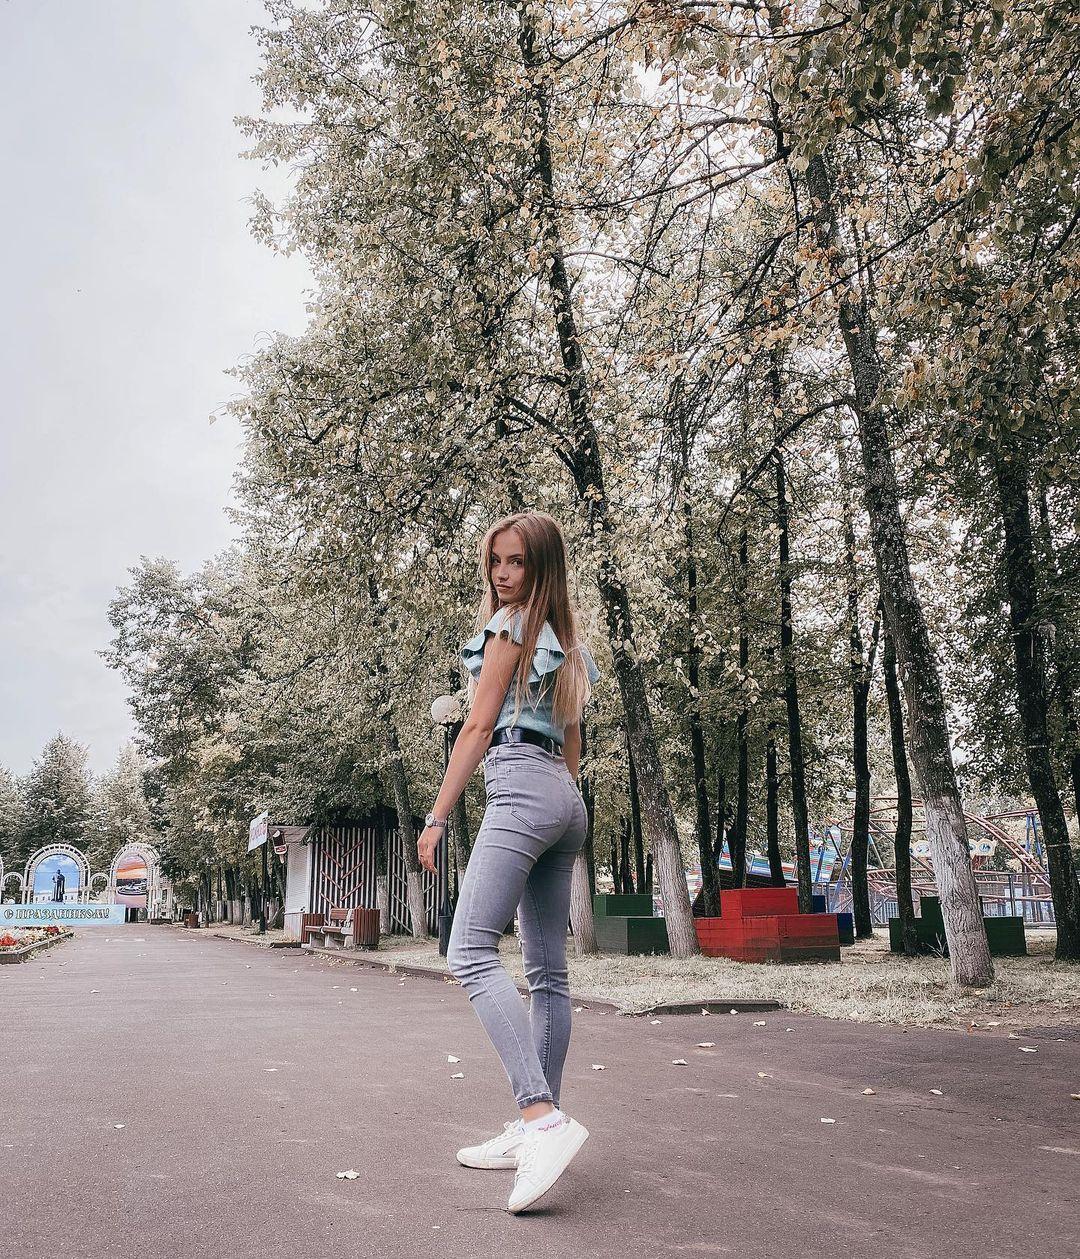 Anastasia-Fefilova-Wallpapers-Insta-Fit-Bio-10